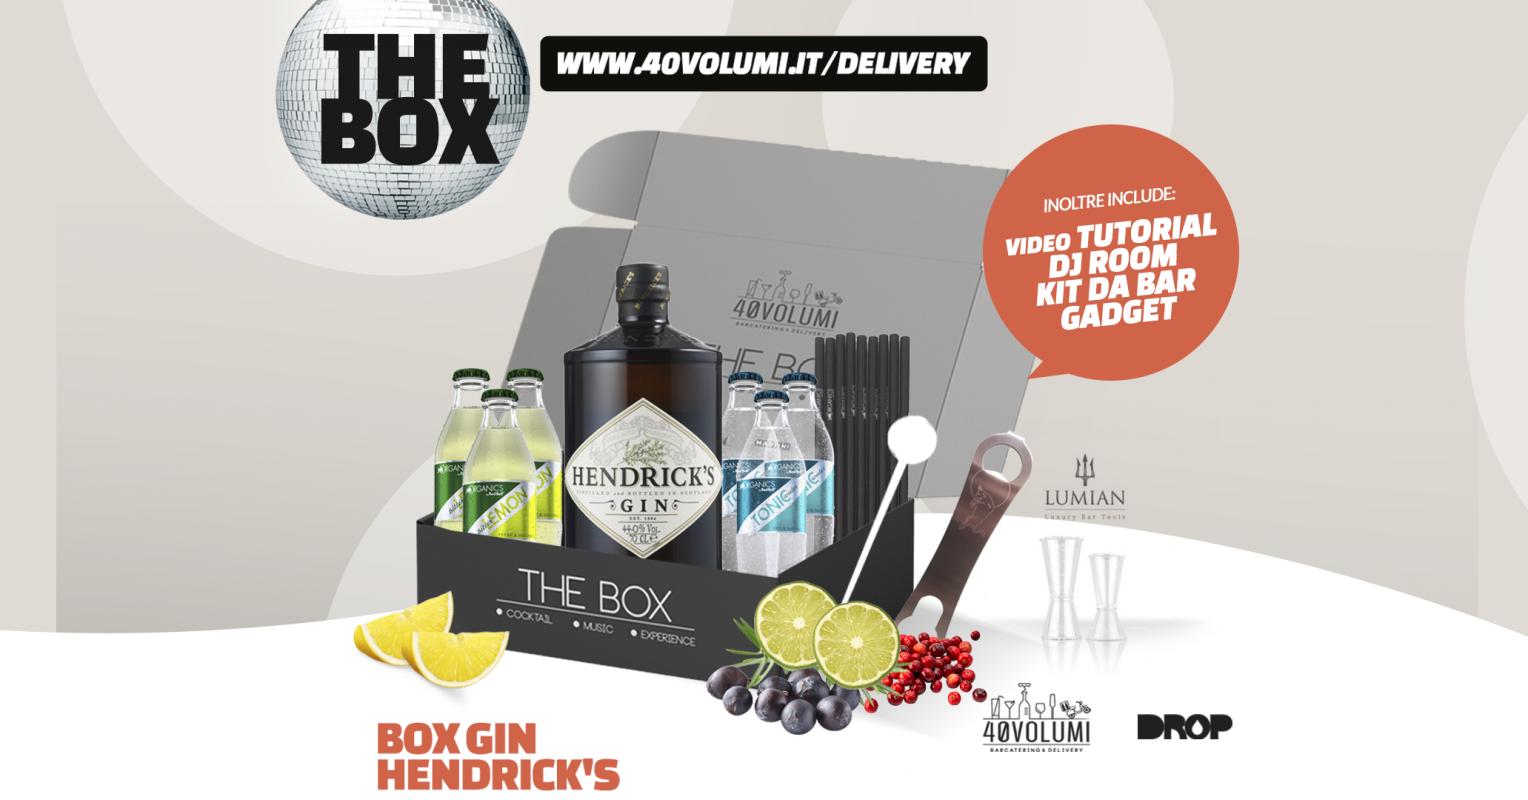 box gin hendrick's per 40 volumi